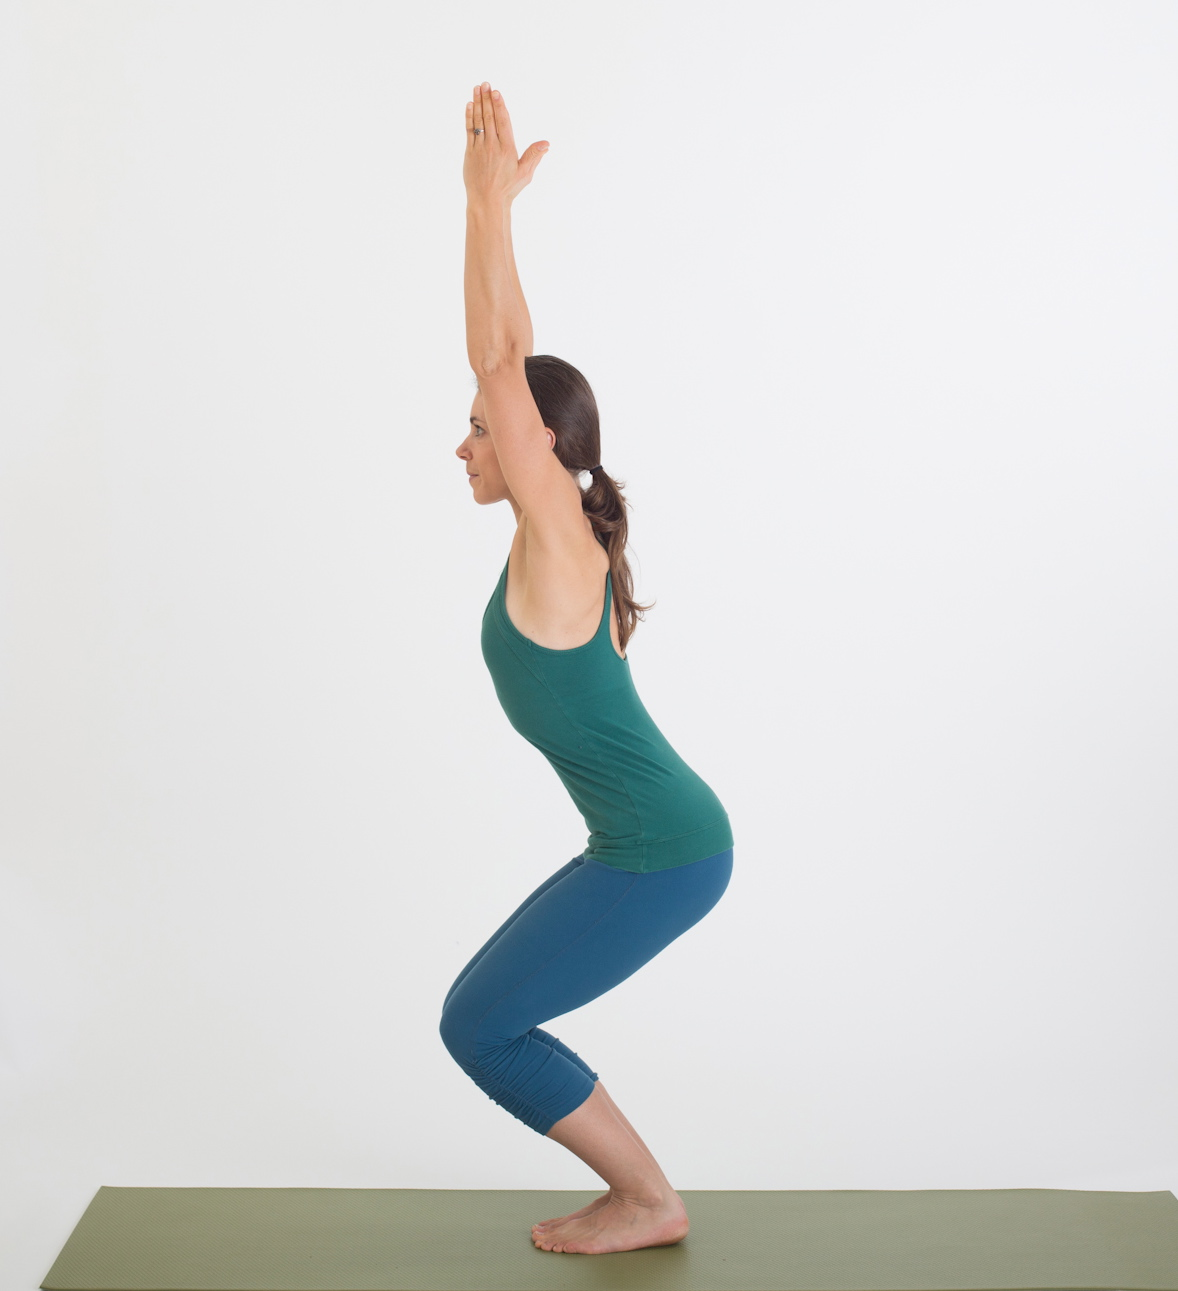 posture chair benefits champagne top utkatasana pose yoga steps and weight